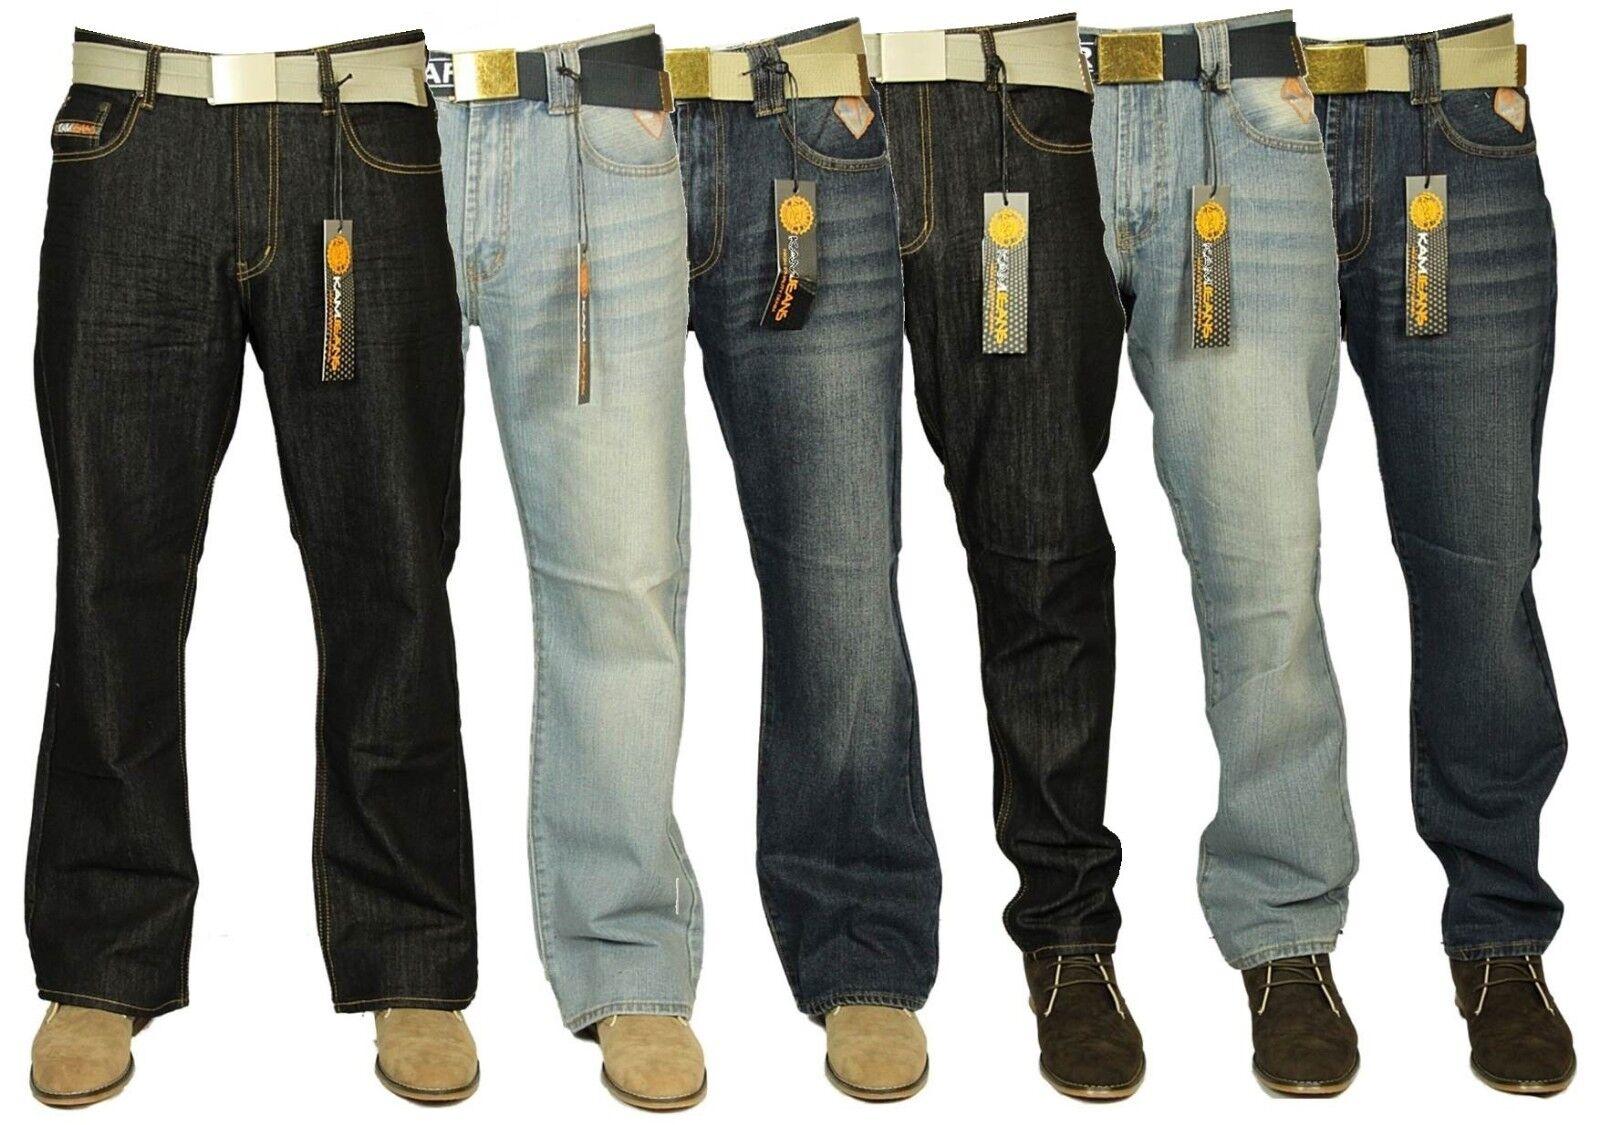 Nuovo Uomo Denim Jeans Bootcut & Gamba Dritta Stile Semplice Pants Nero Blu